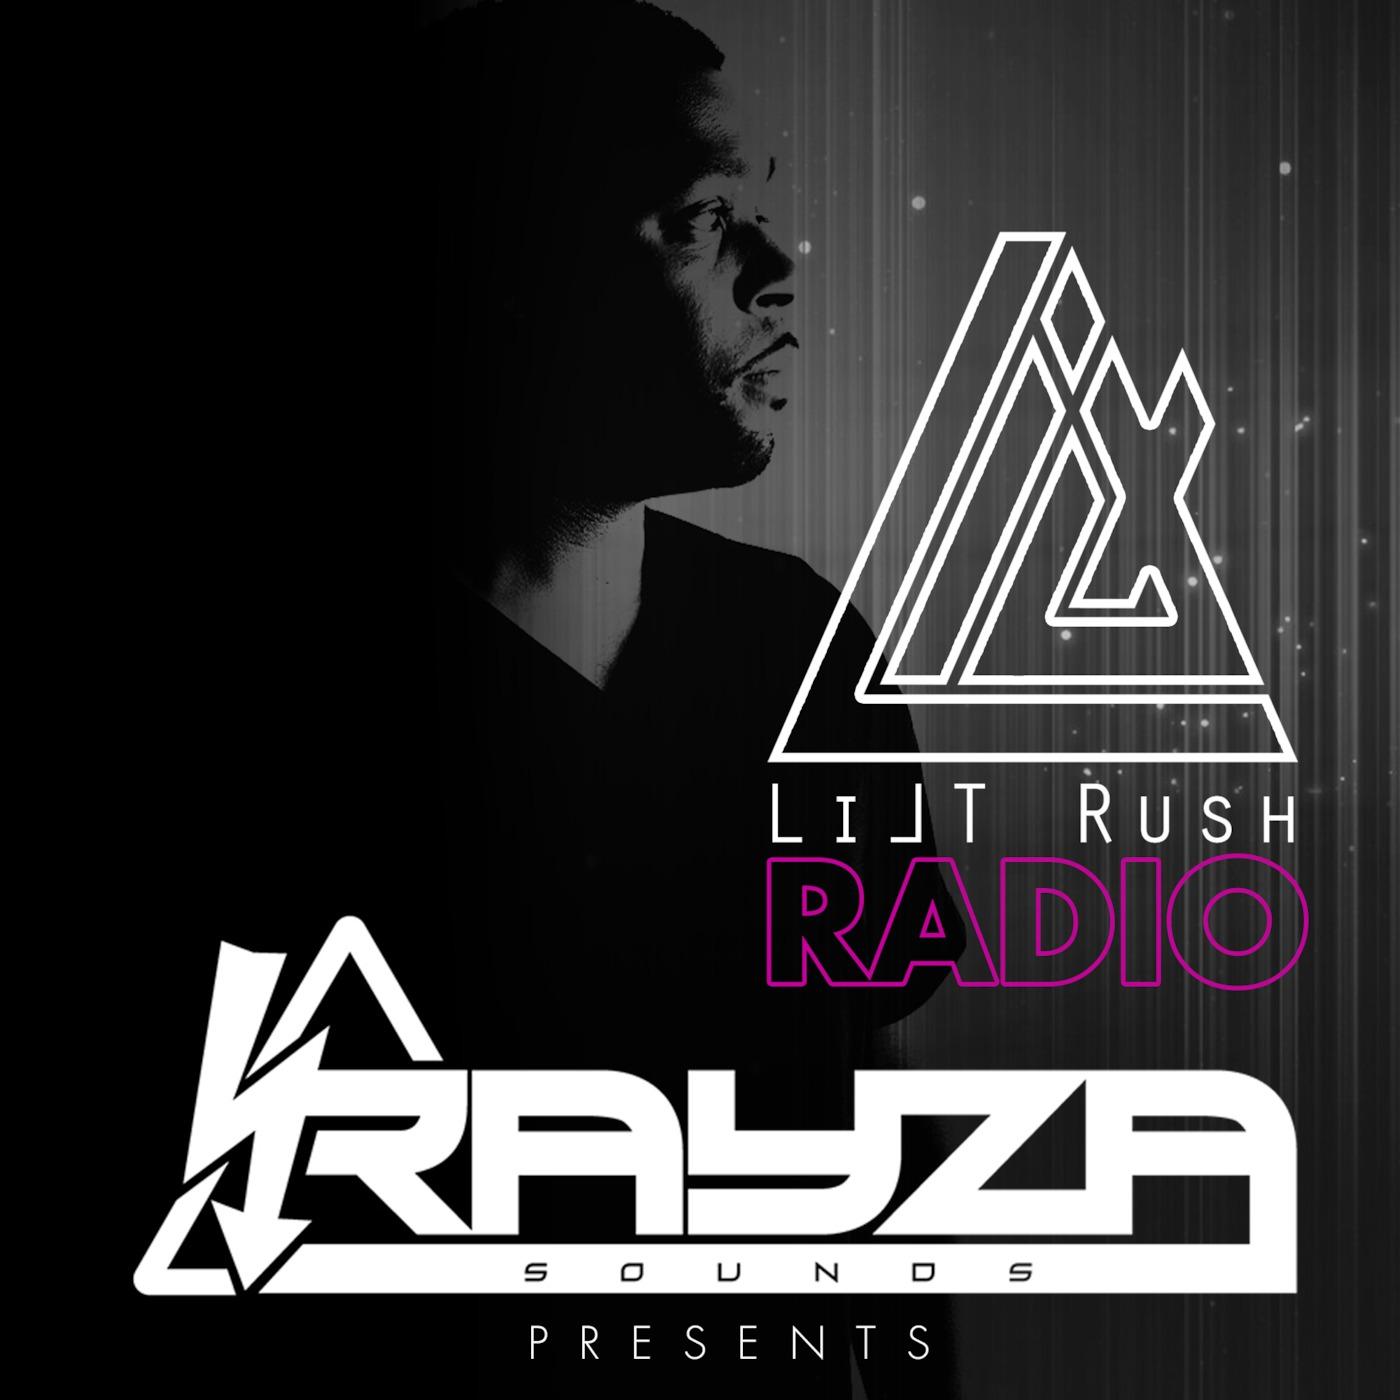 Rayza Sounds Presents - LILT RUSH RADIO